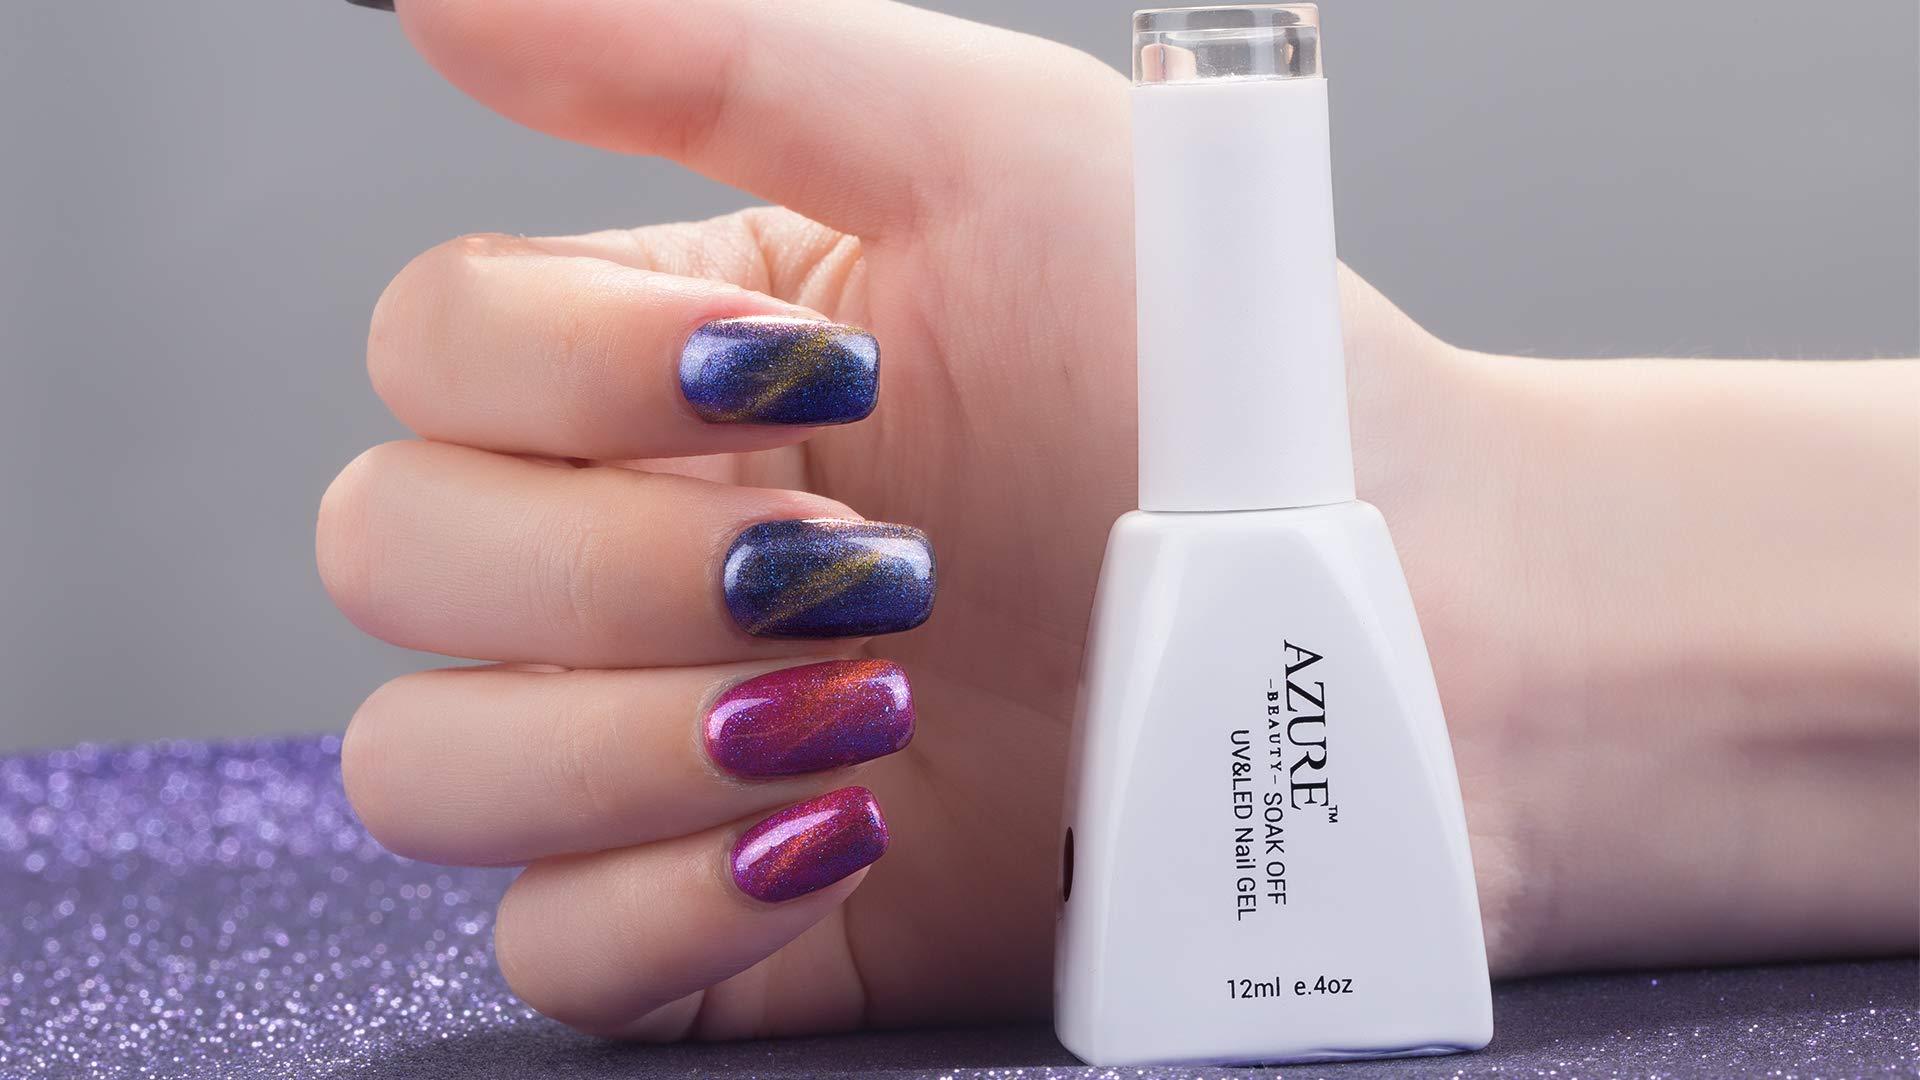 Cat Eyes Gel Magnetic Chameleon Gel Nail Polish Soak Off UV LED Nail Polish 6 Colors Set 12ML by AZUREBEAUTY by AZUREBEAUTY (Image #3)